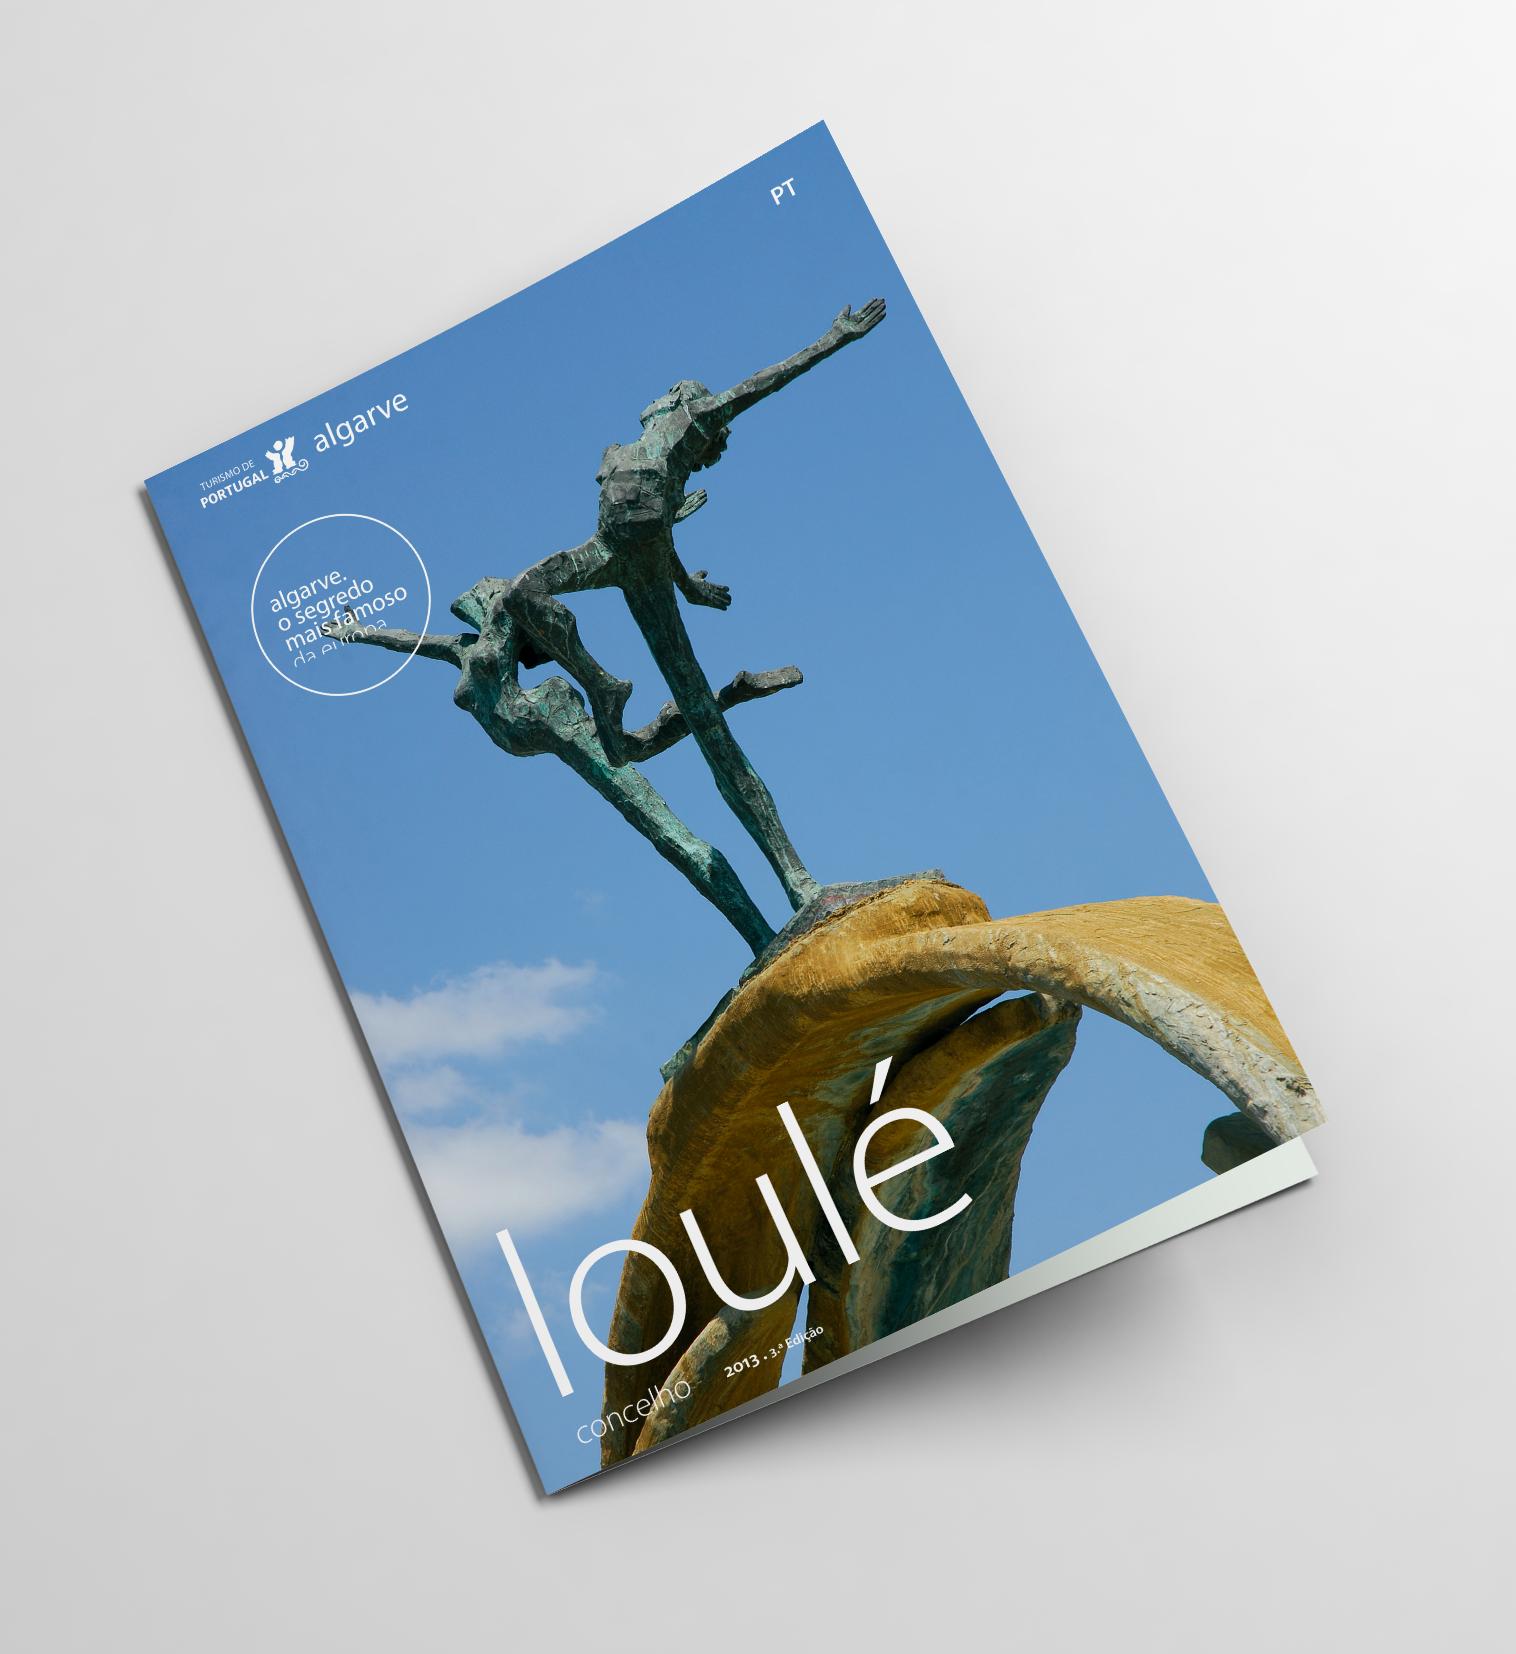 Loulé Brochure